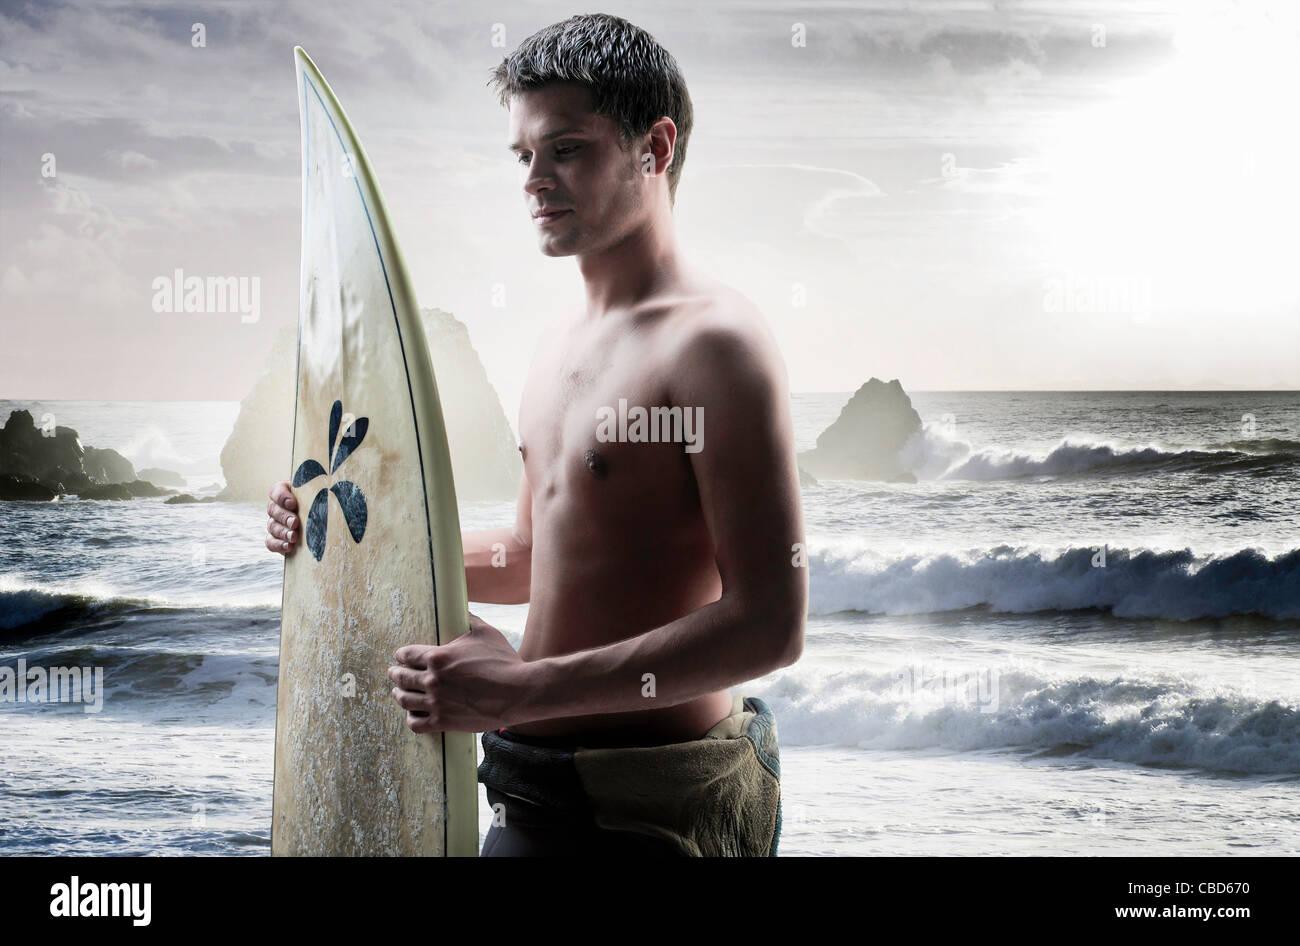 Man carrying surfboard on beach Stock Photo